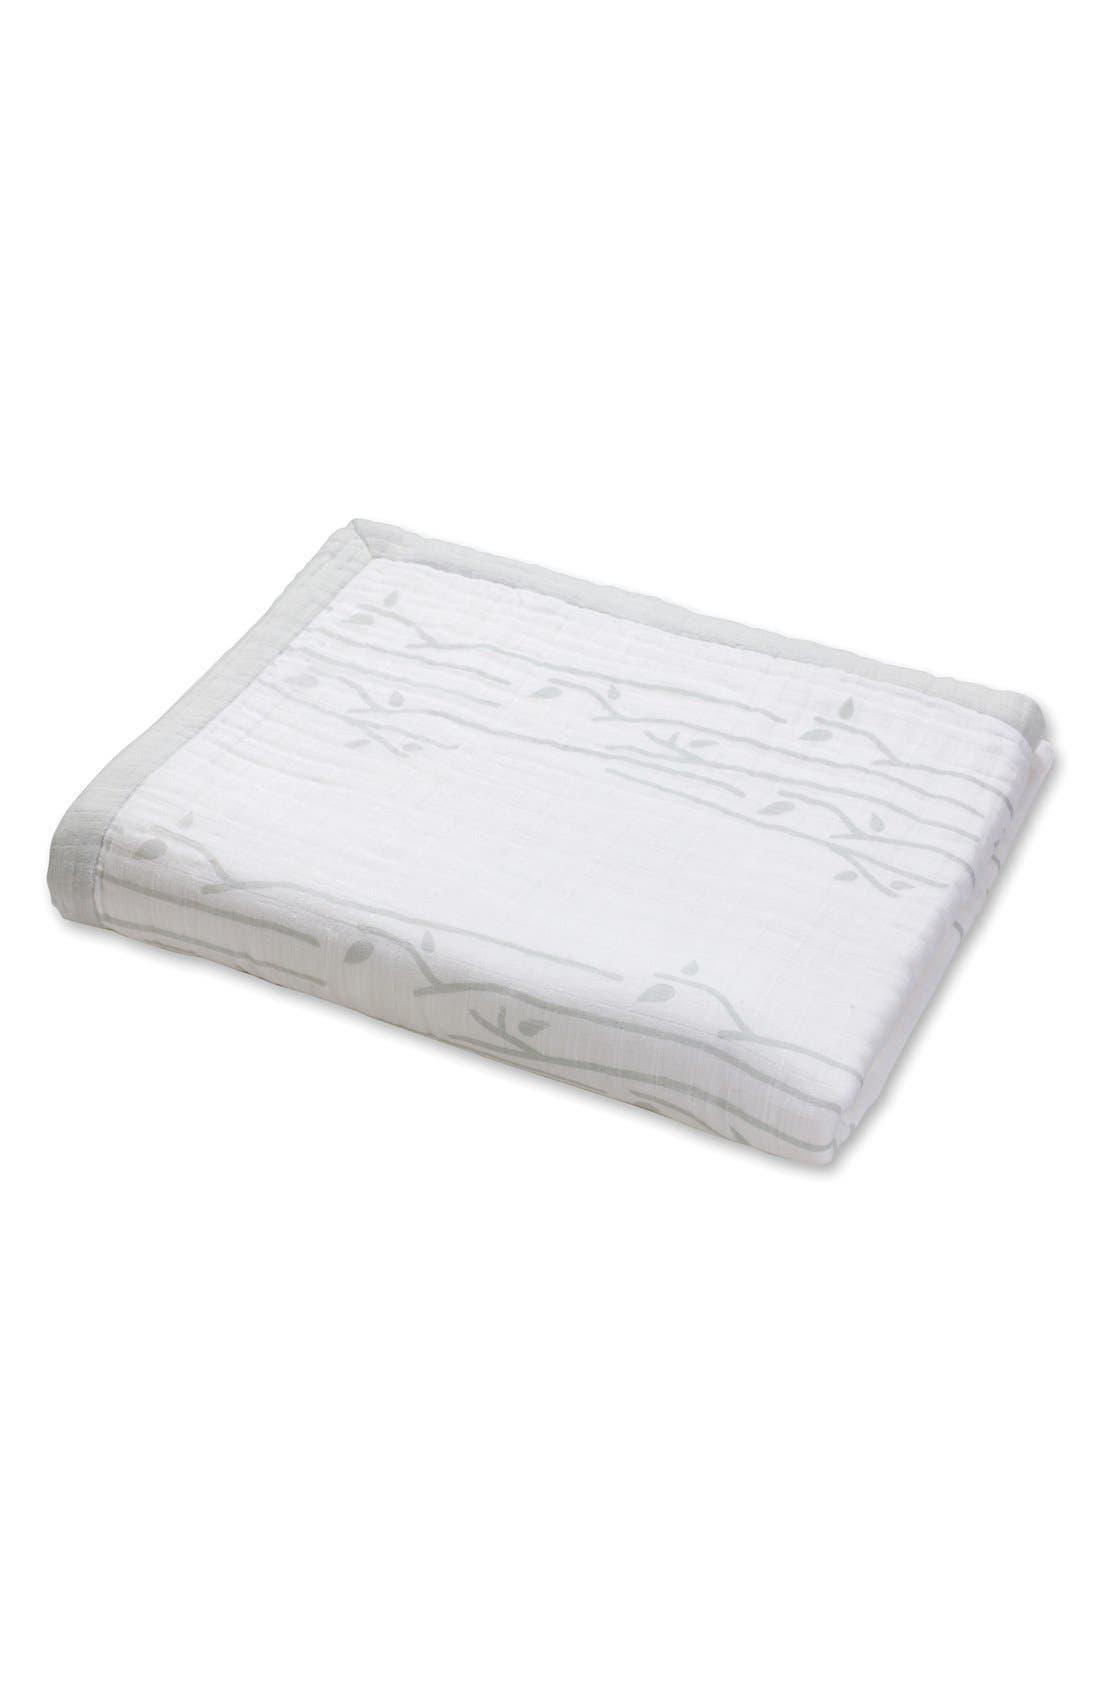 Alternate Image 2  - aden + anais Classic Daydream Blanket™